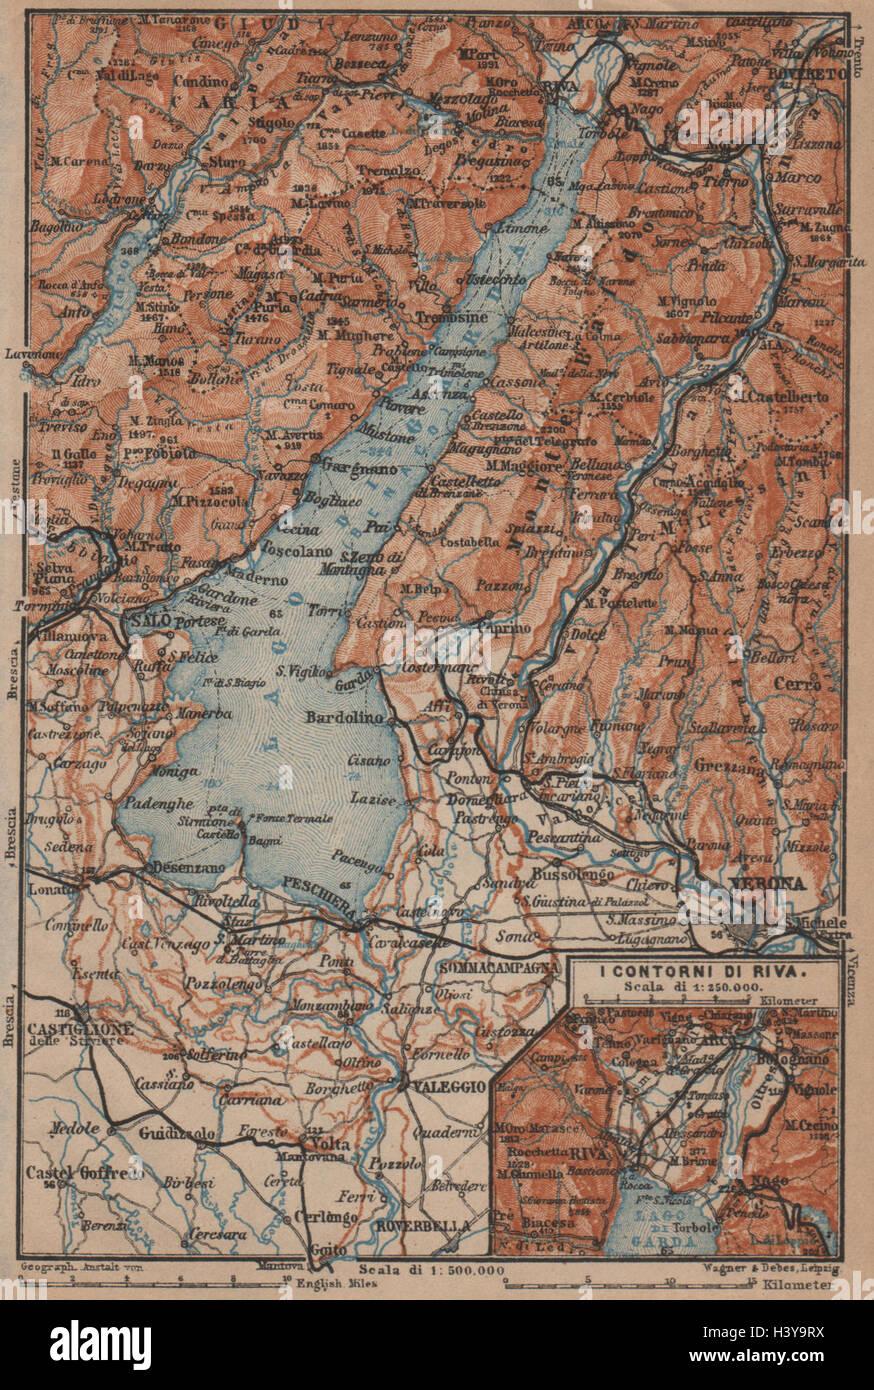 Karte Italien Gardasee.Lago Di Gardasee Riva Salo Peschiera Verona Topo Karte Italien